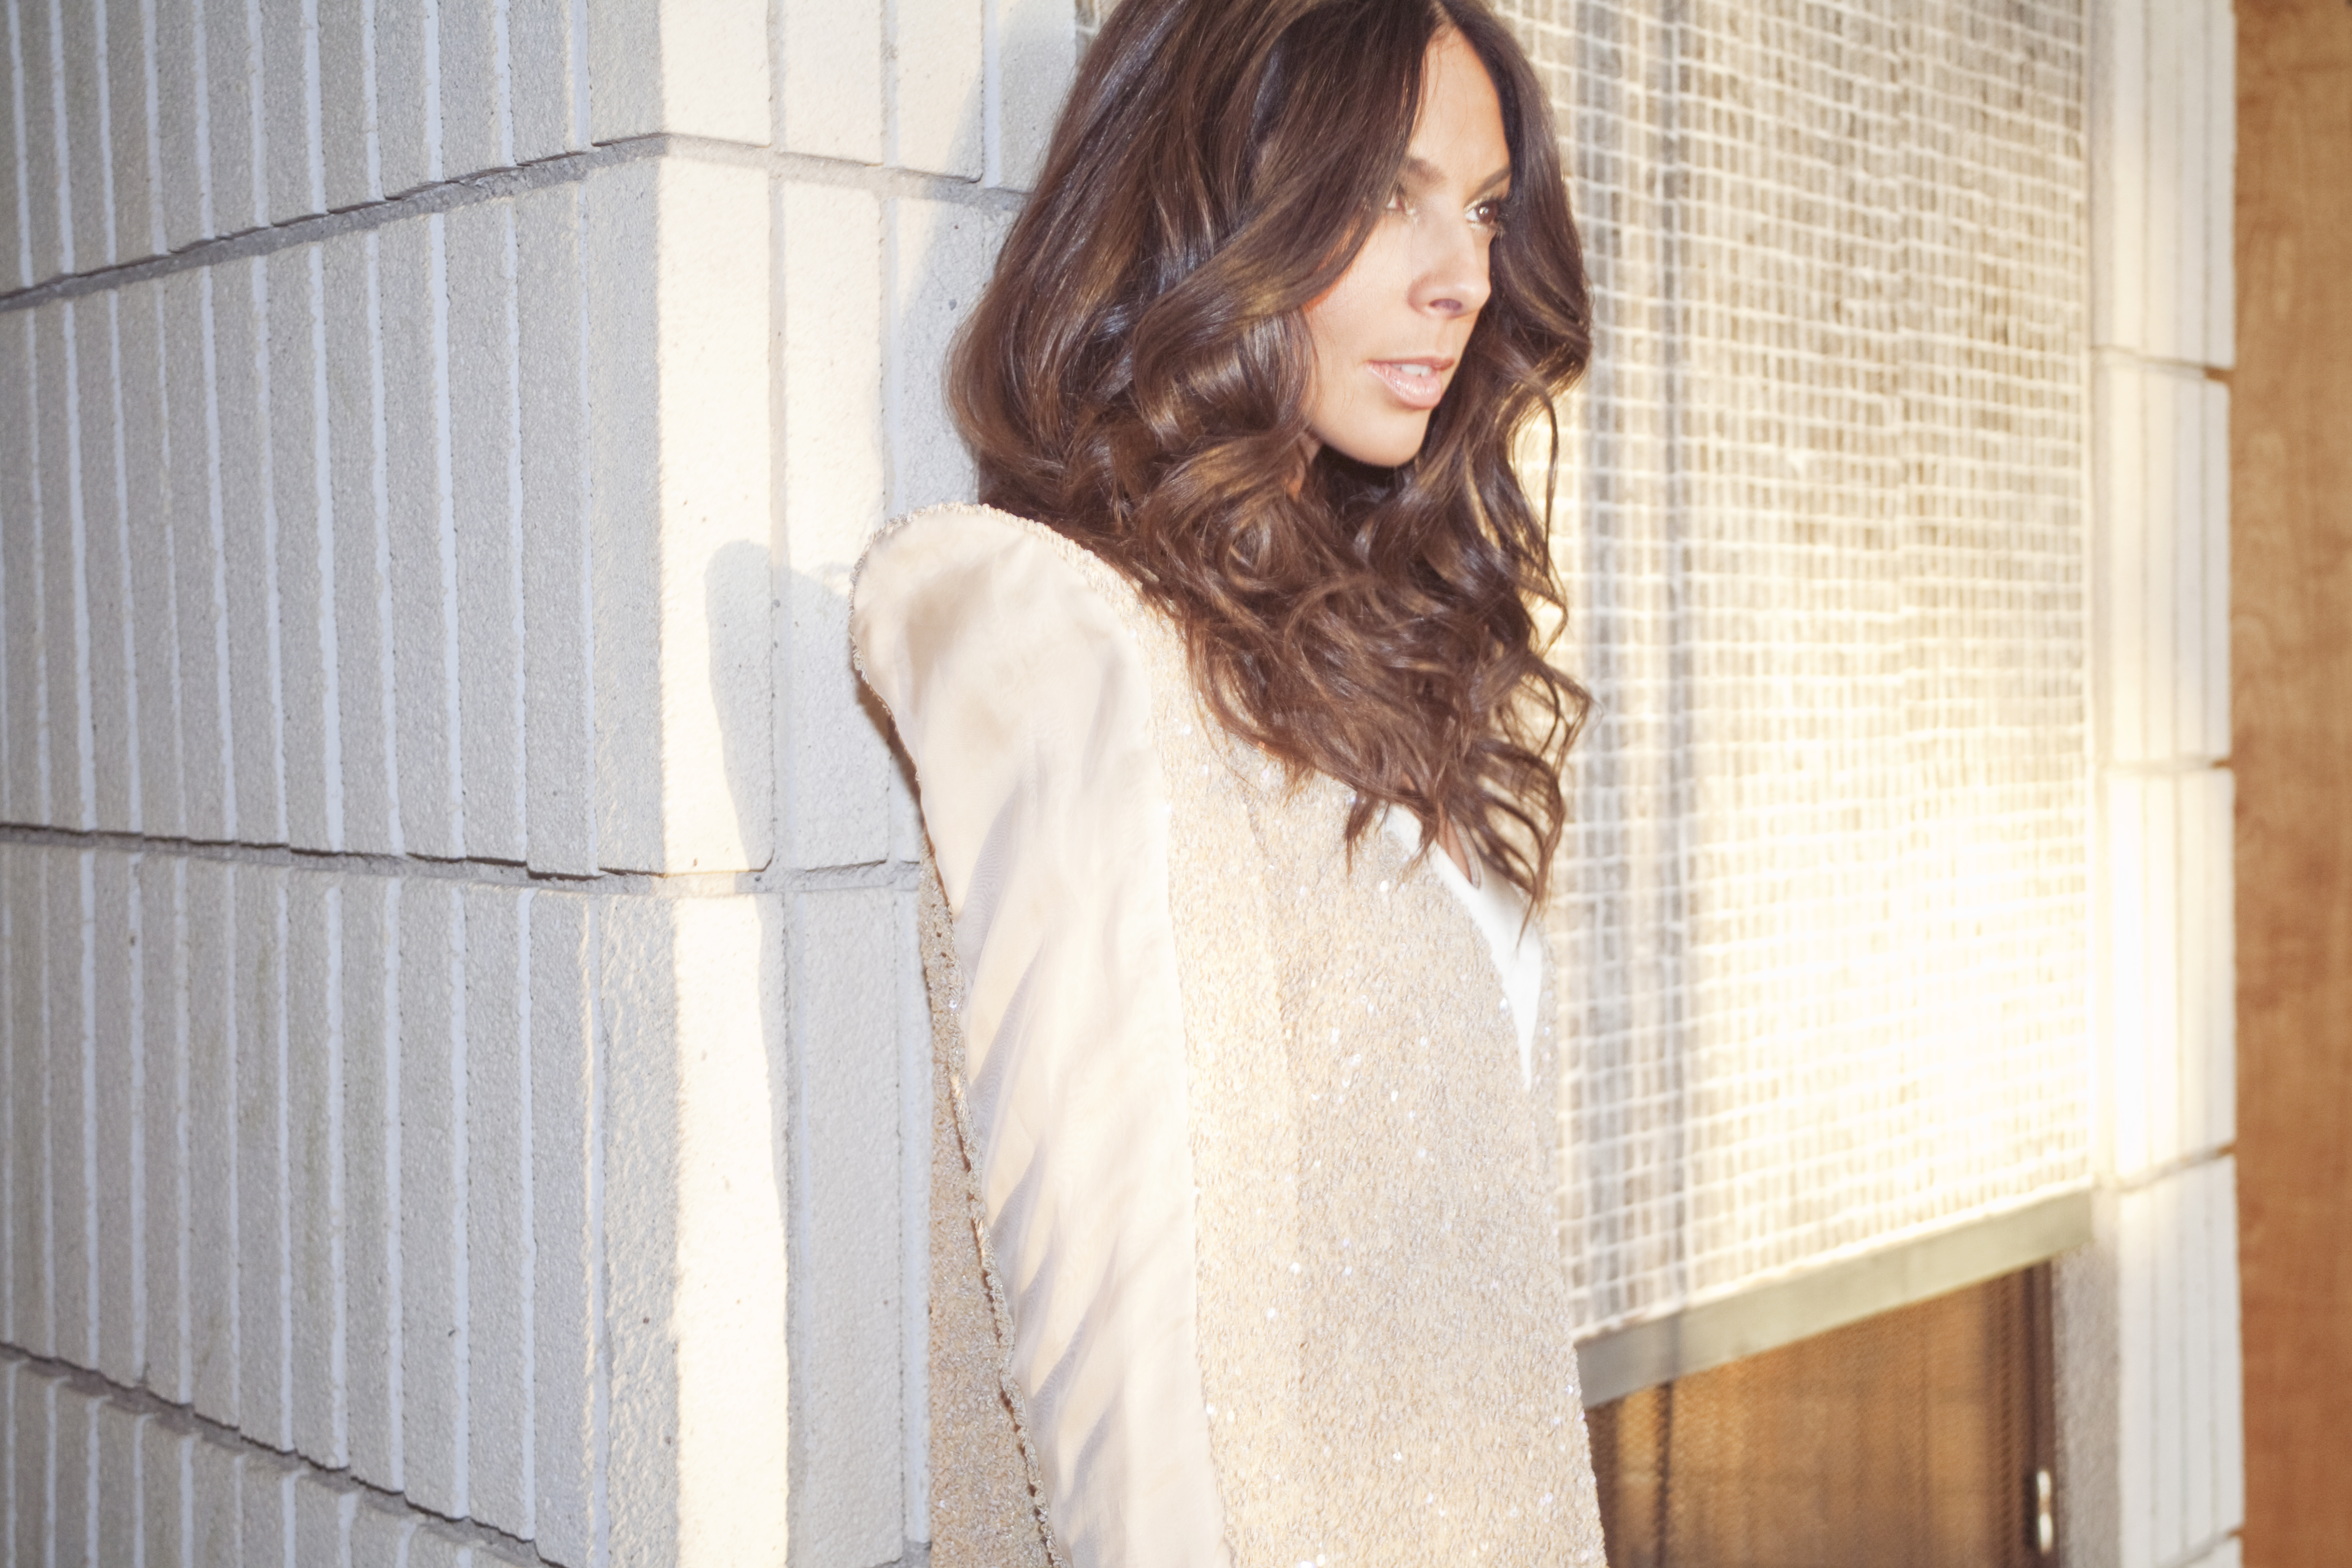 Terri Seymour / Grazia Magazine